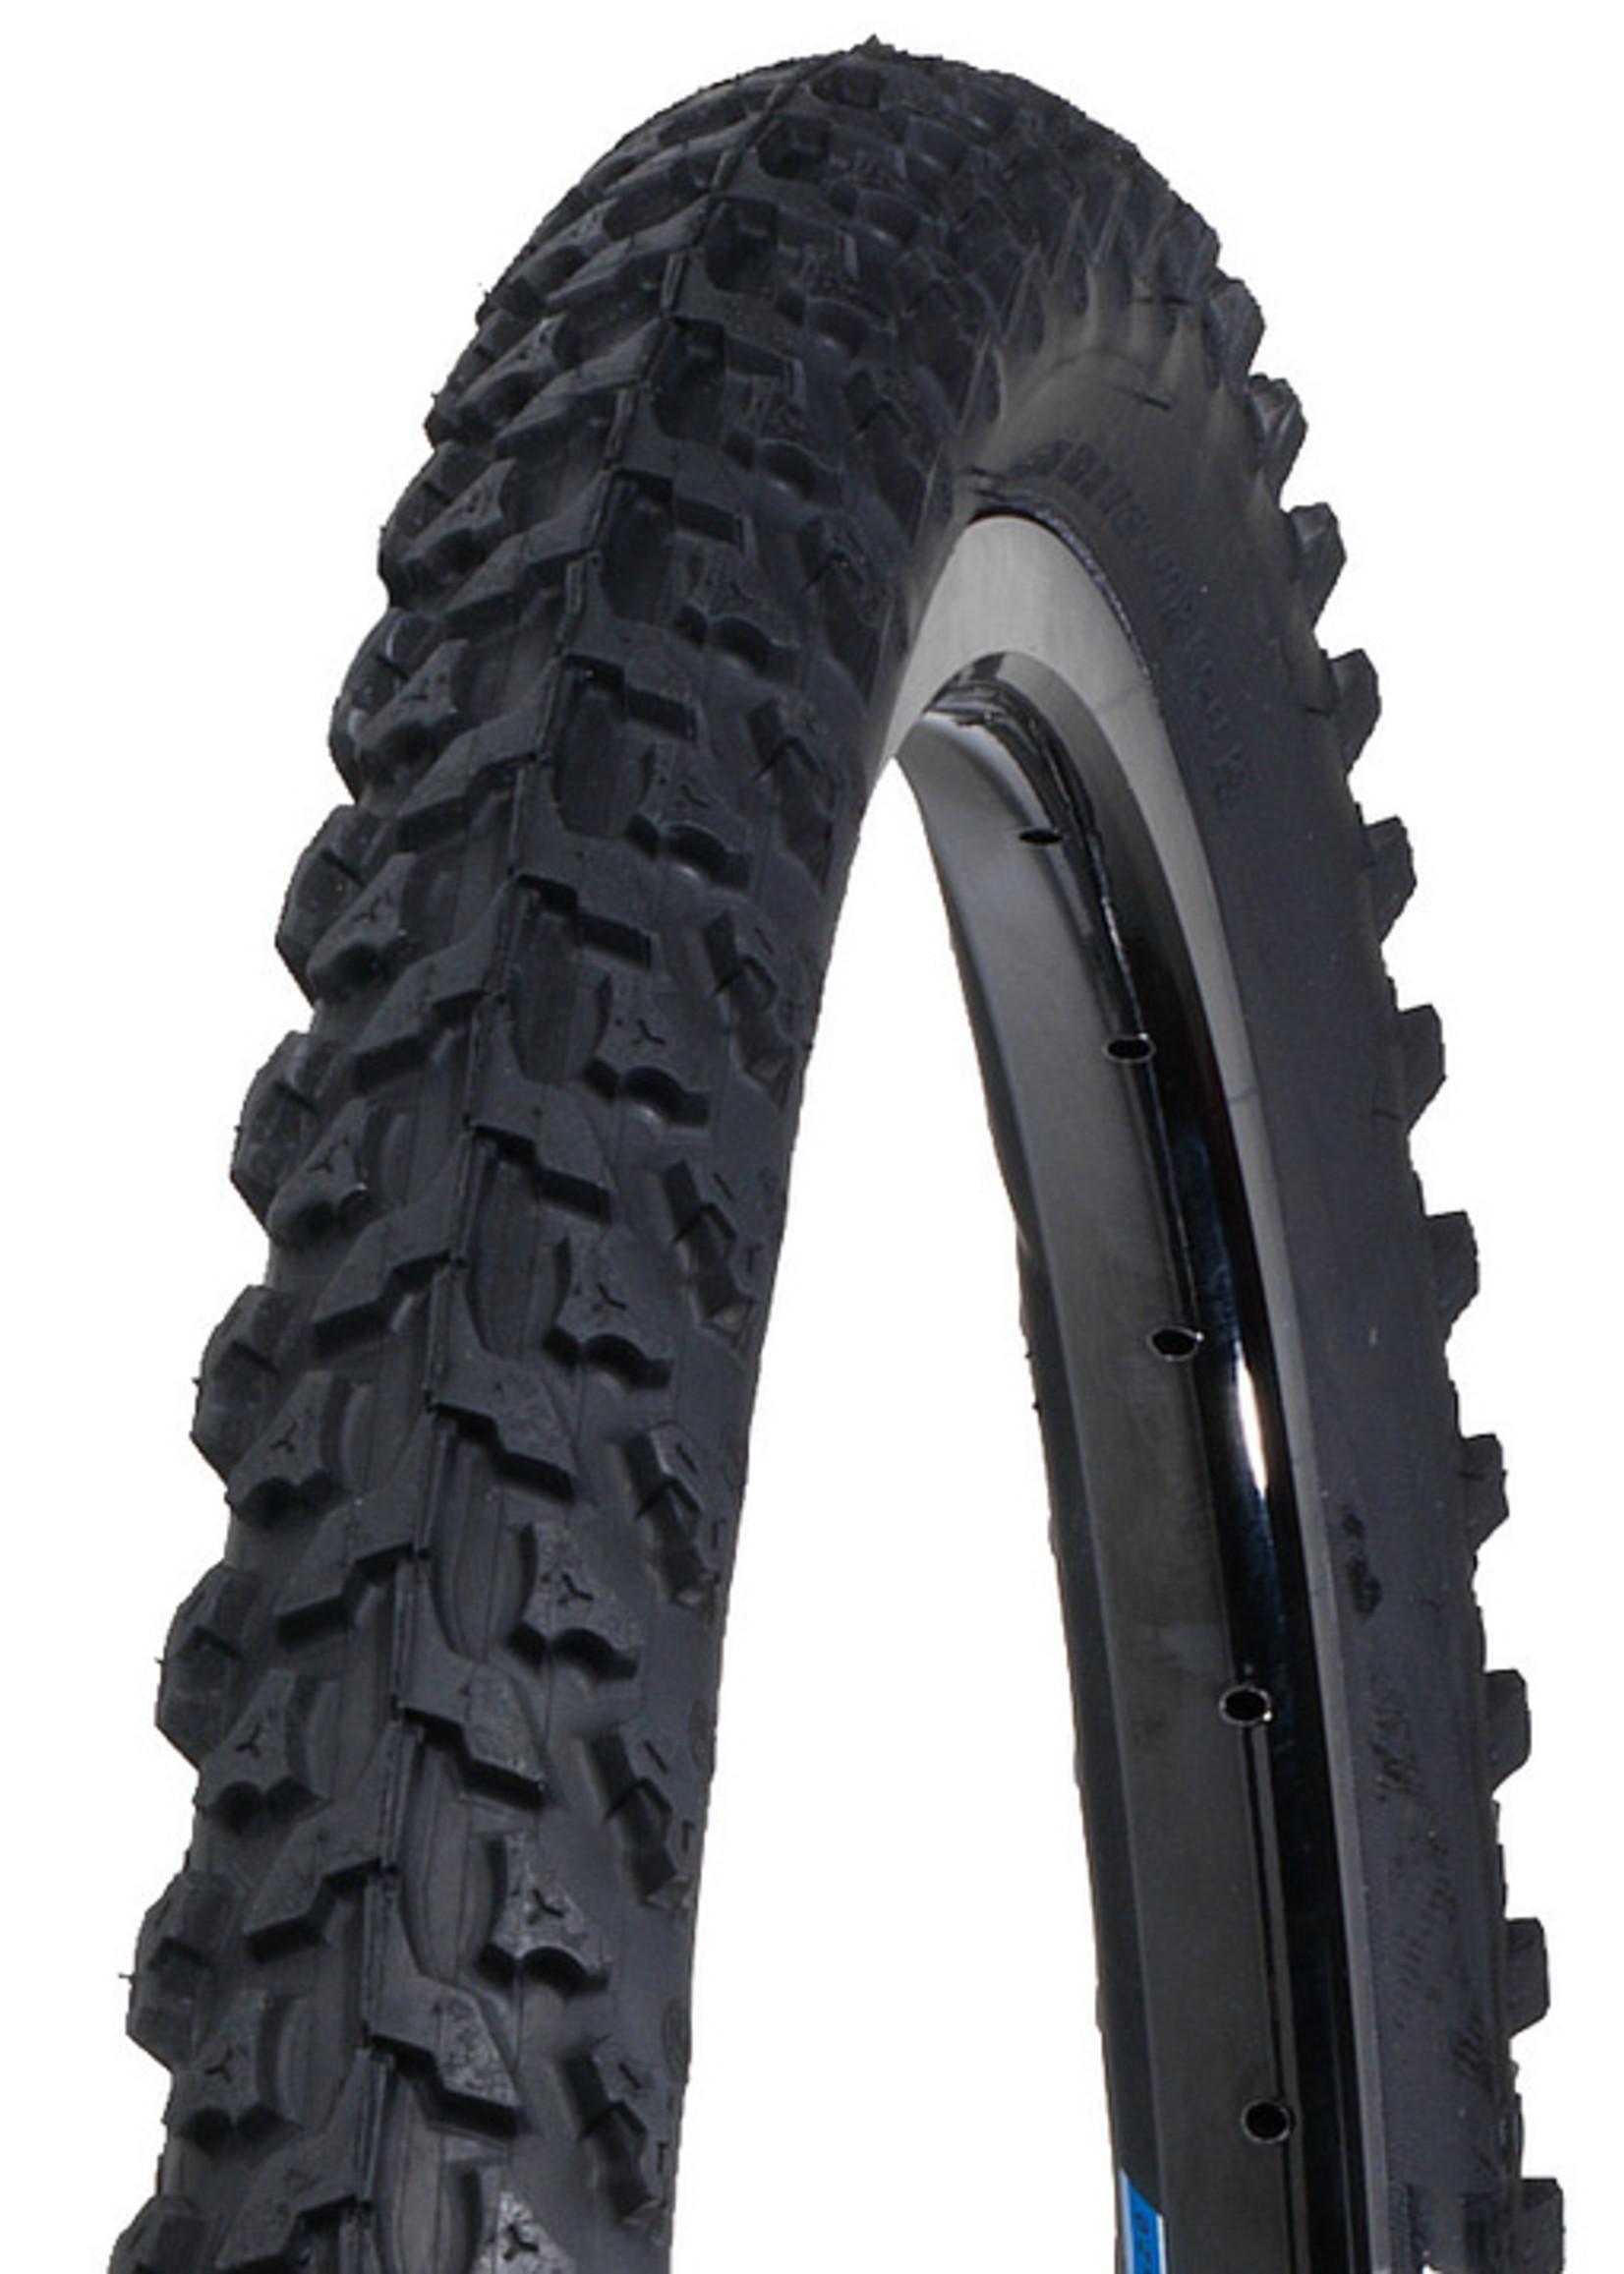 Bontrager Tire Bontrager Connection Trail Hard Case 29 x 2.0